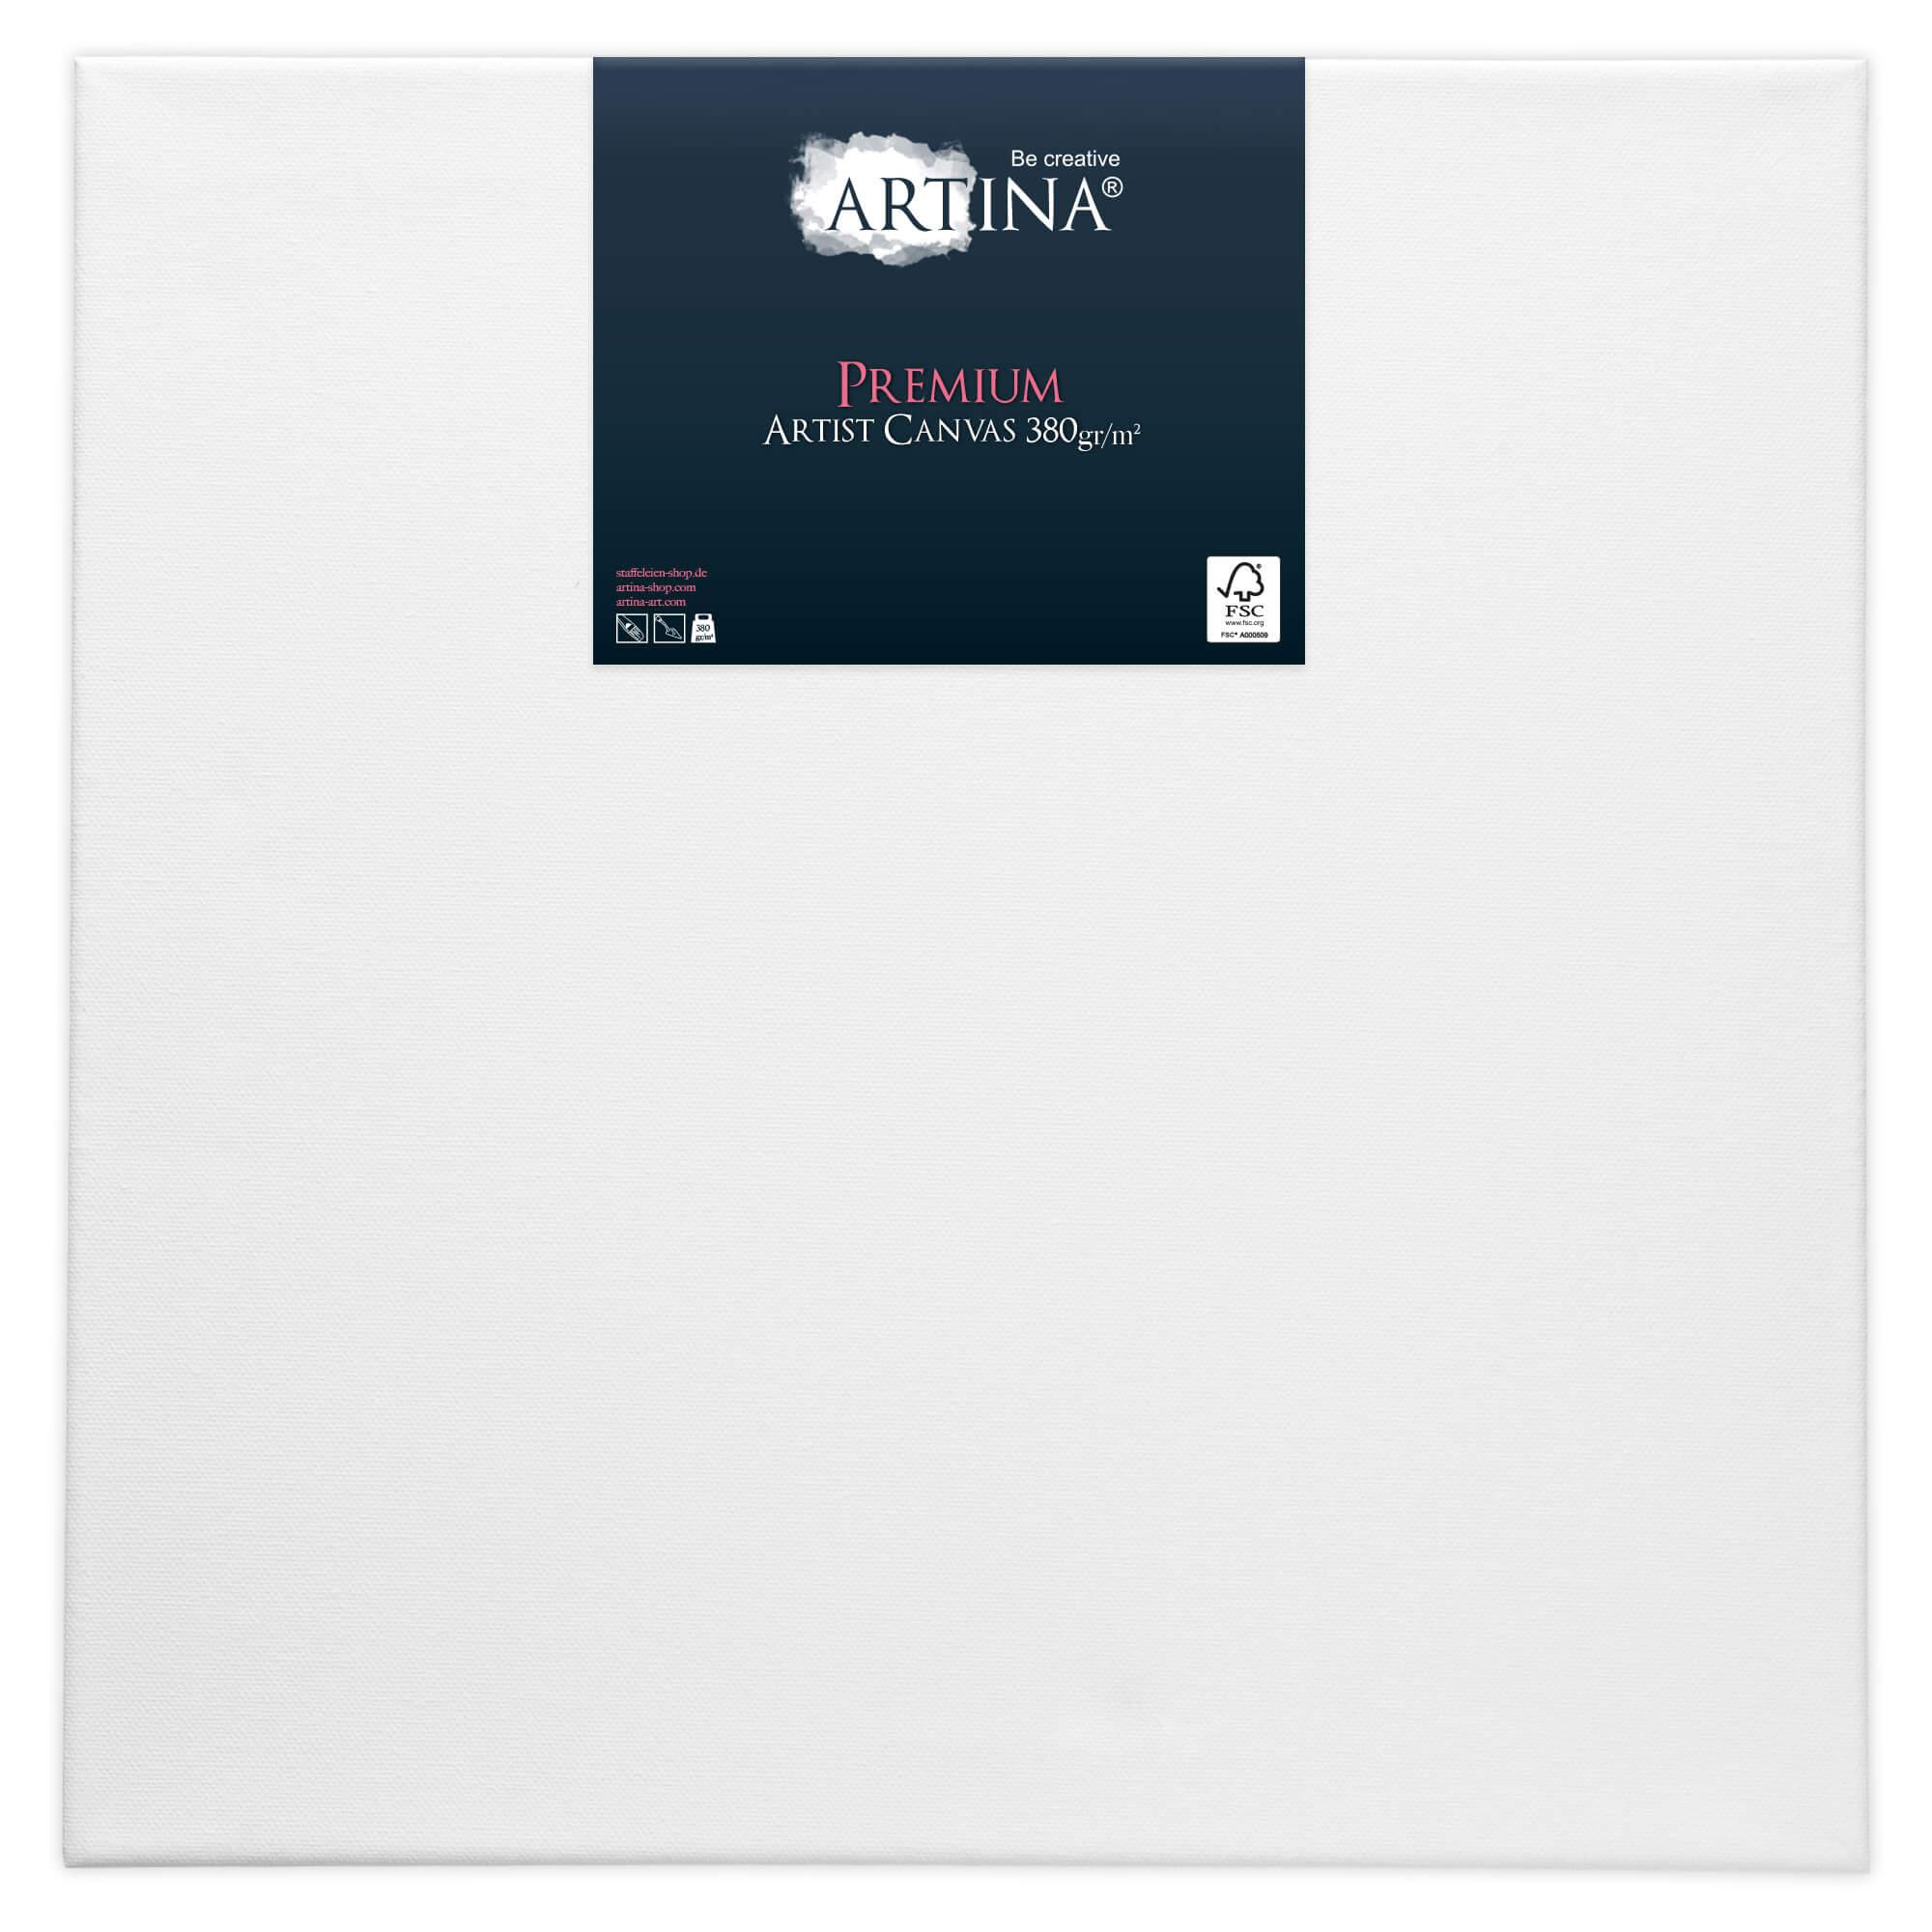 Artina Premium Keilrahmen Leinwand 80 x 80 cm